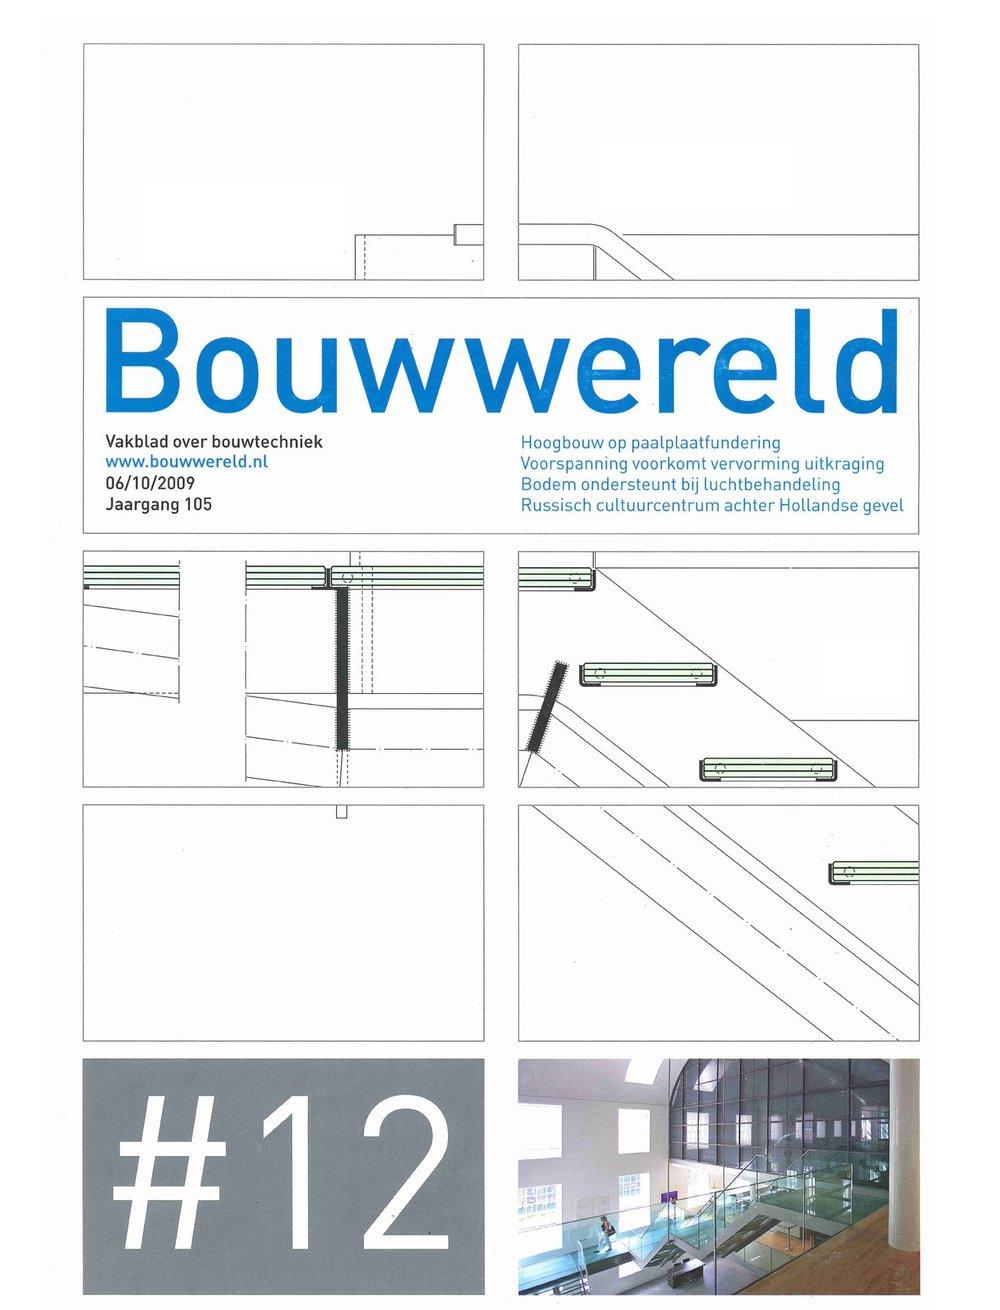 bowwereld.jpg